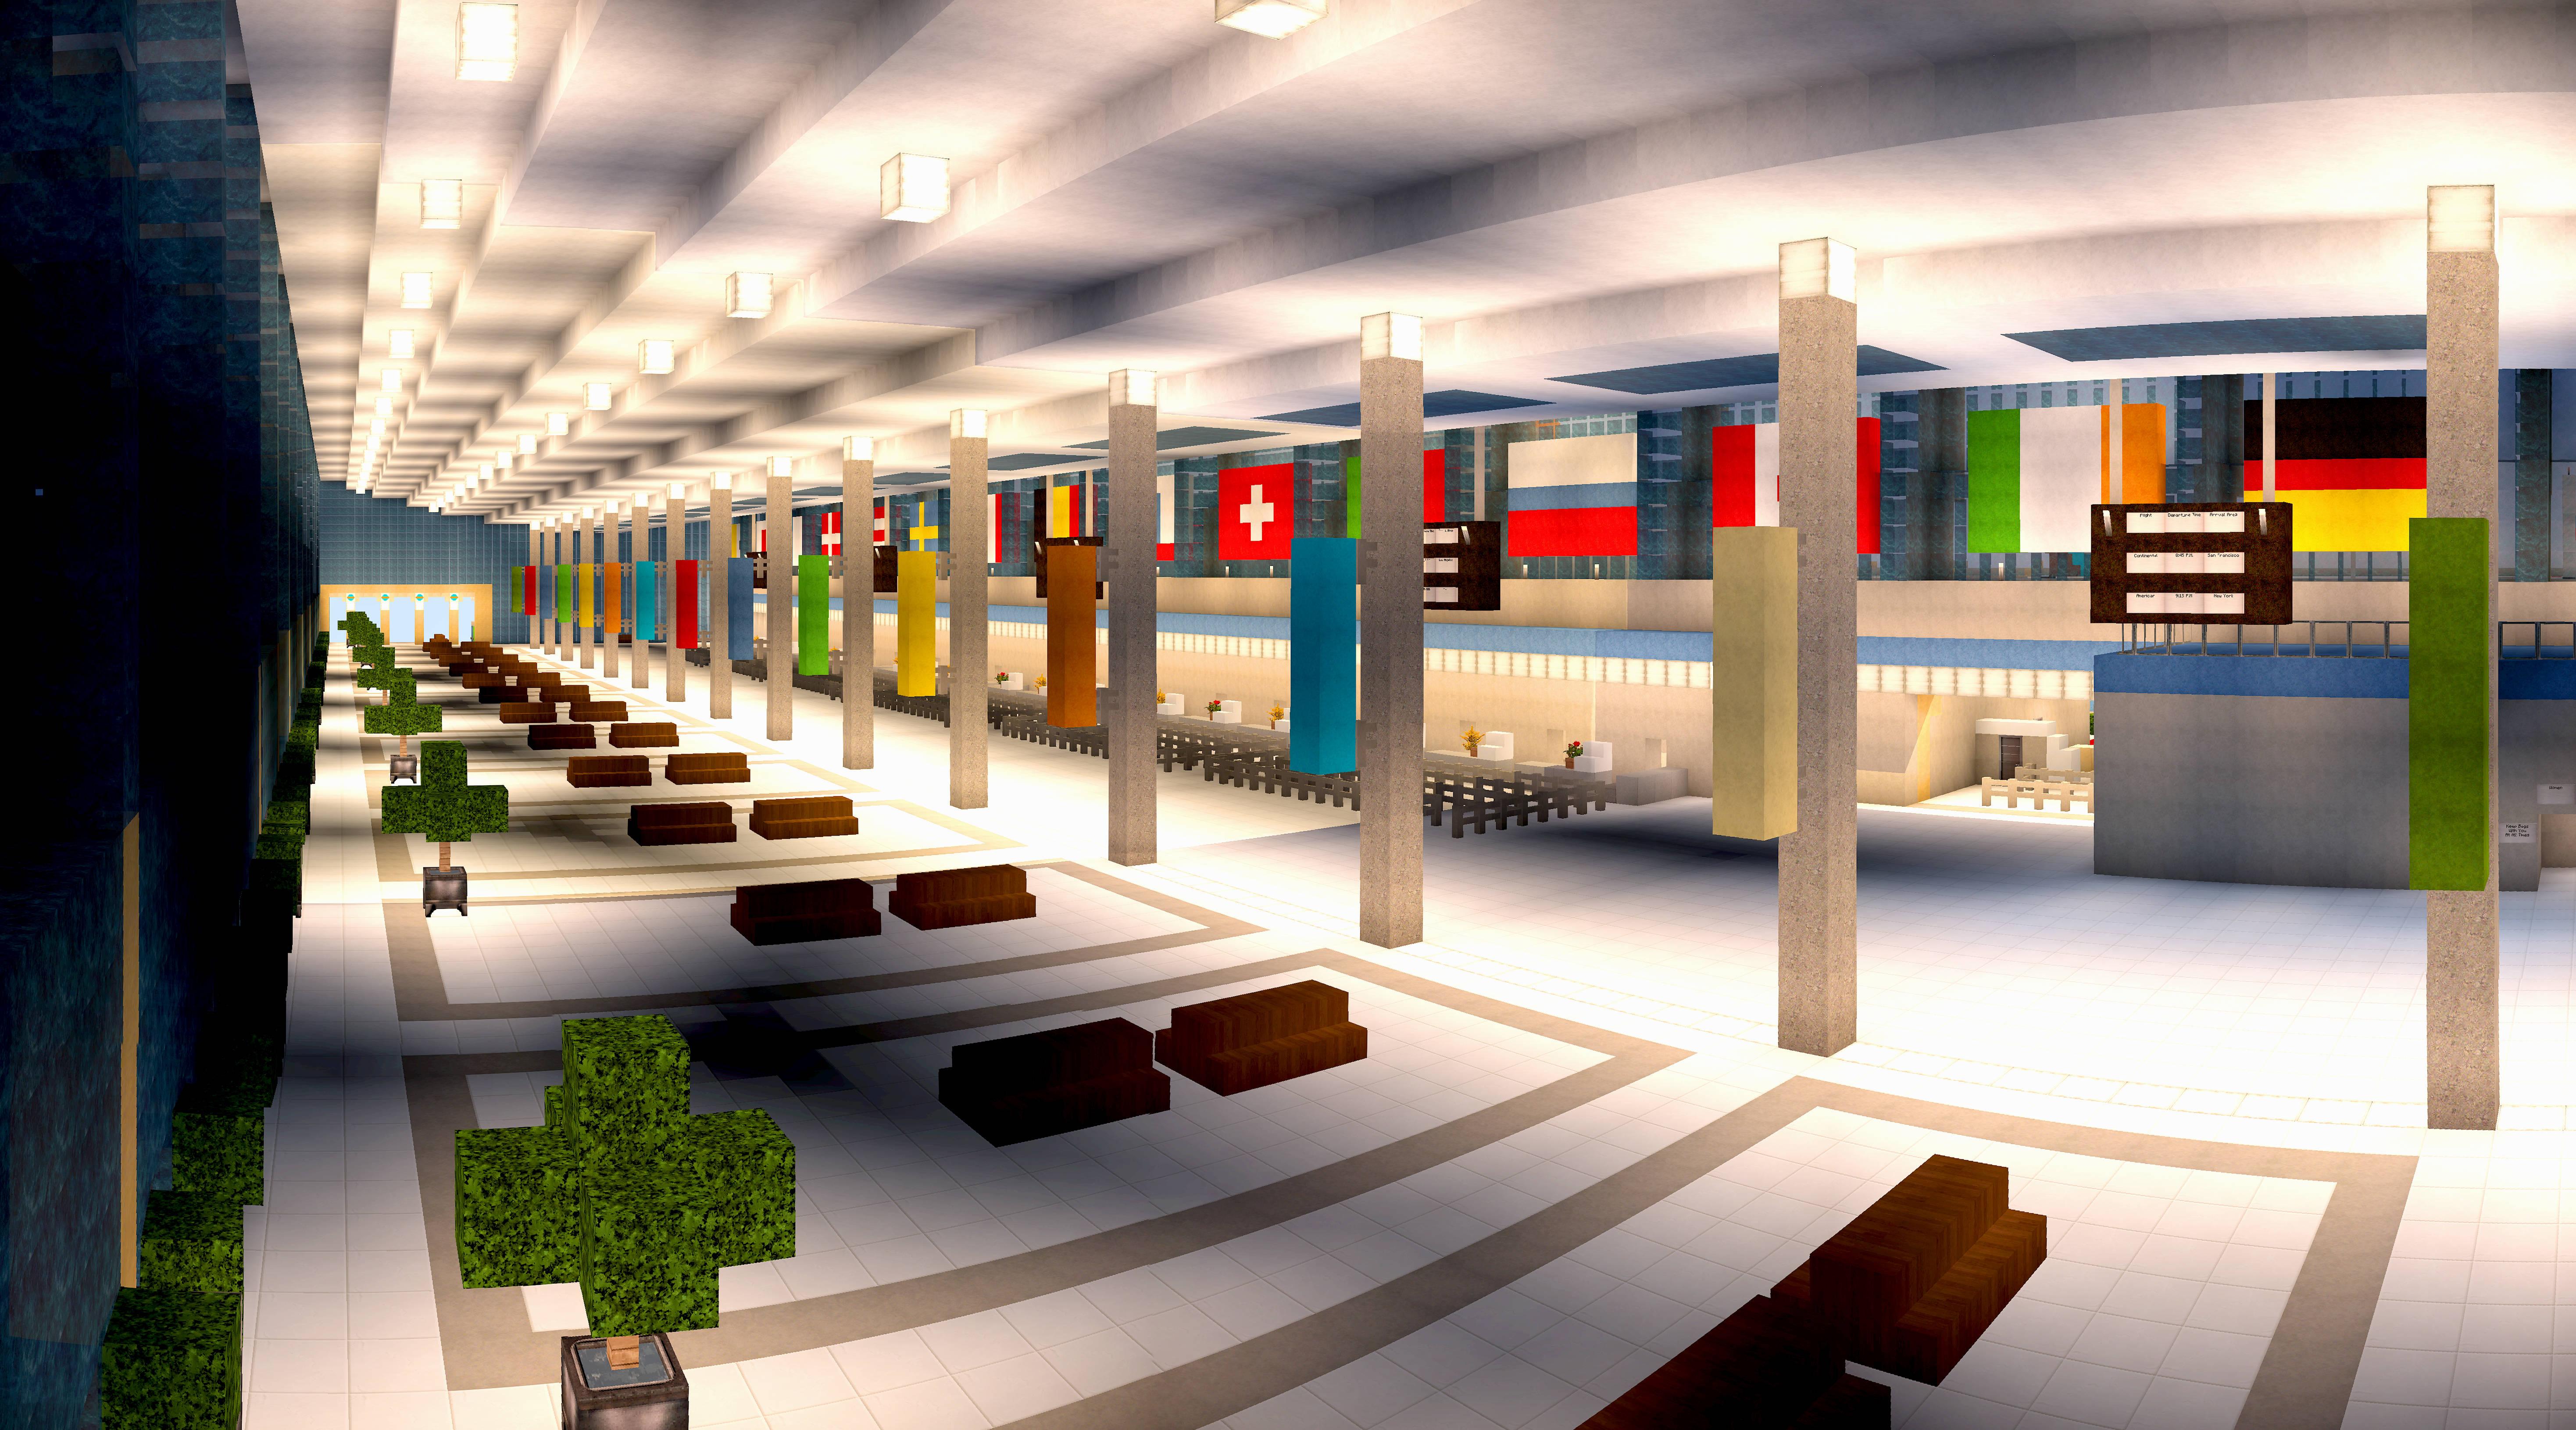 Airport Train Station Built By YazurX 411864510 on Minecraft Wall Designs